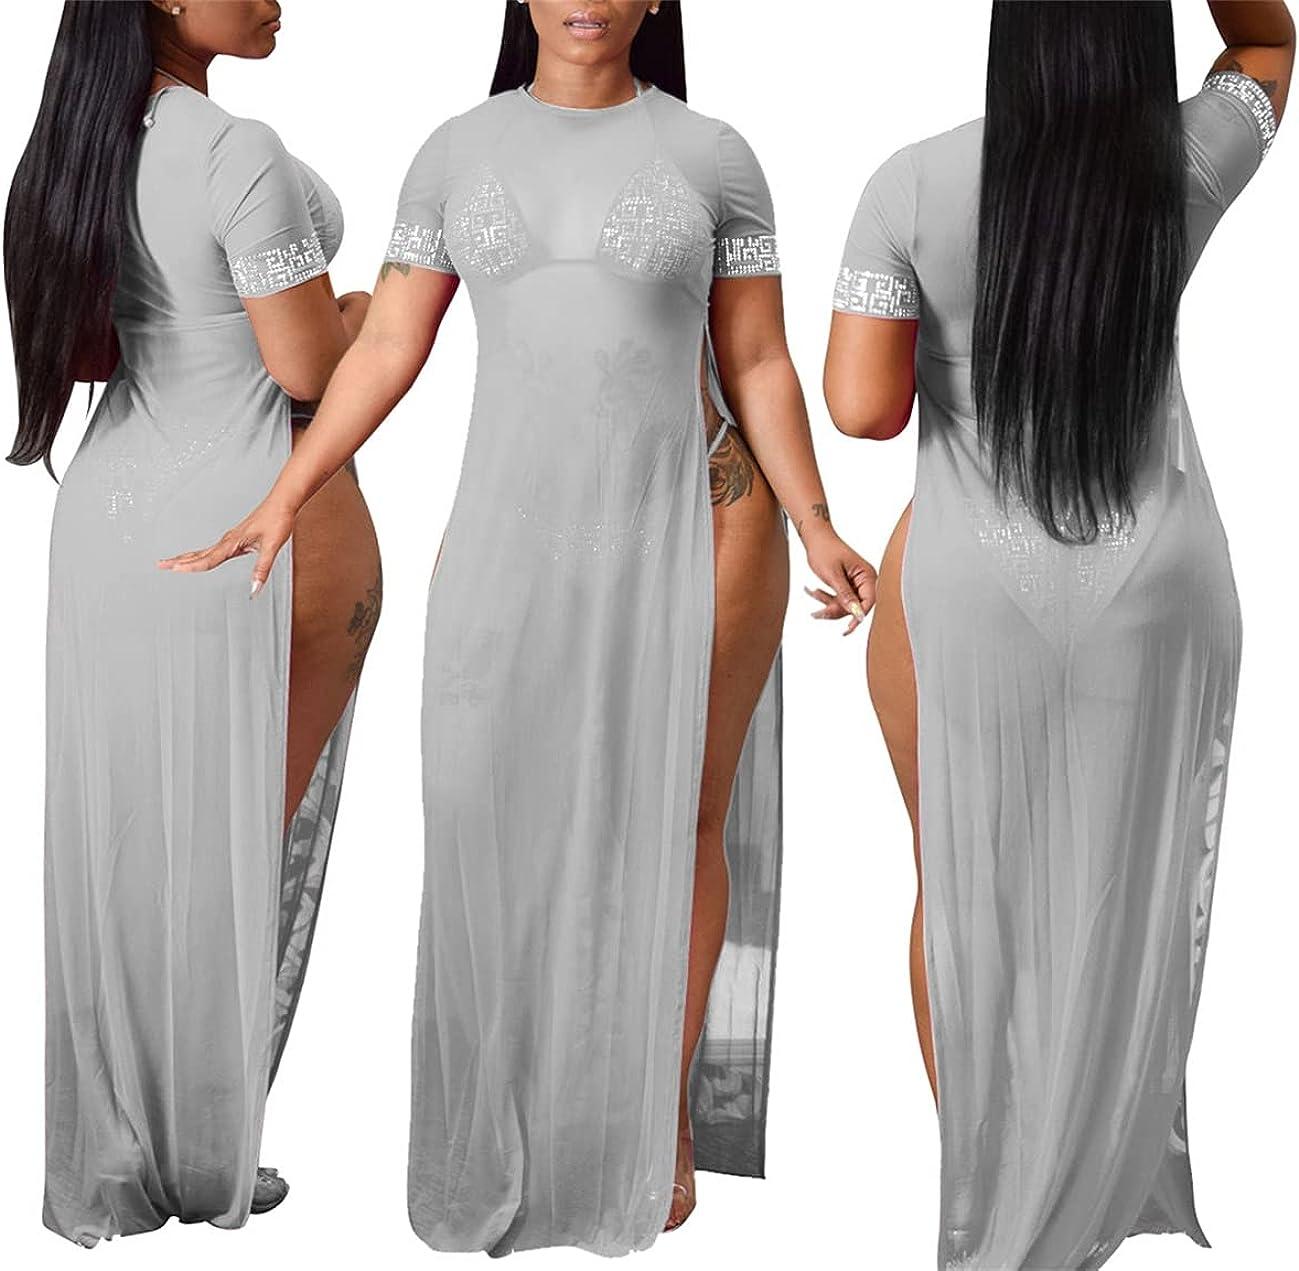 Mintsnow Women Sleeveless Sheer Mesh Bodycon Maxi Dress Bodysuit Party Clubwear